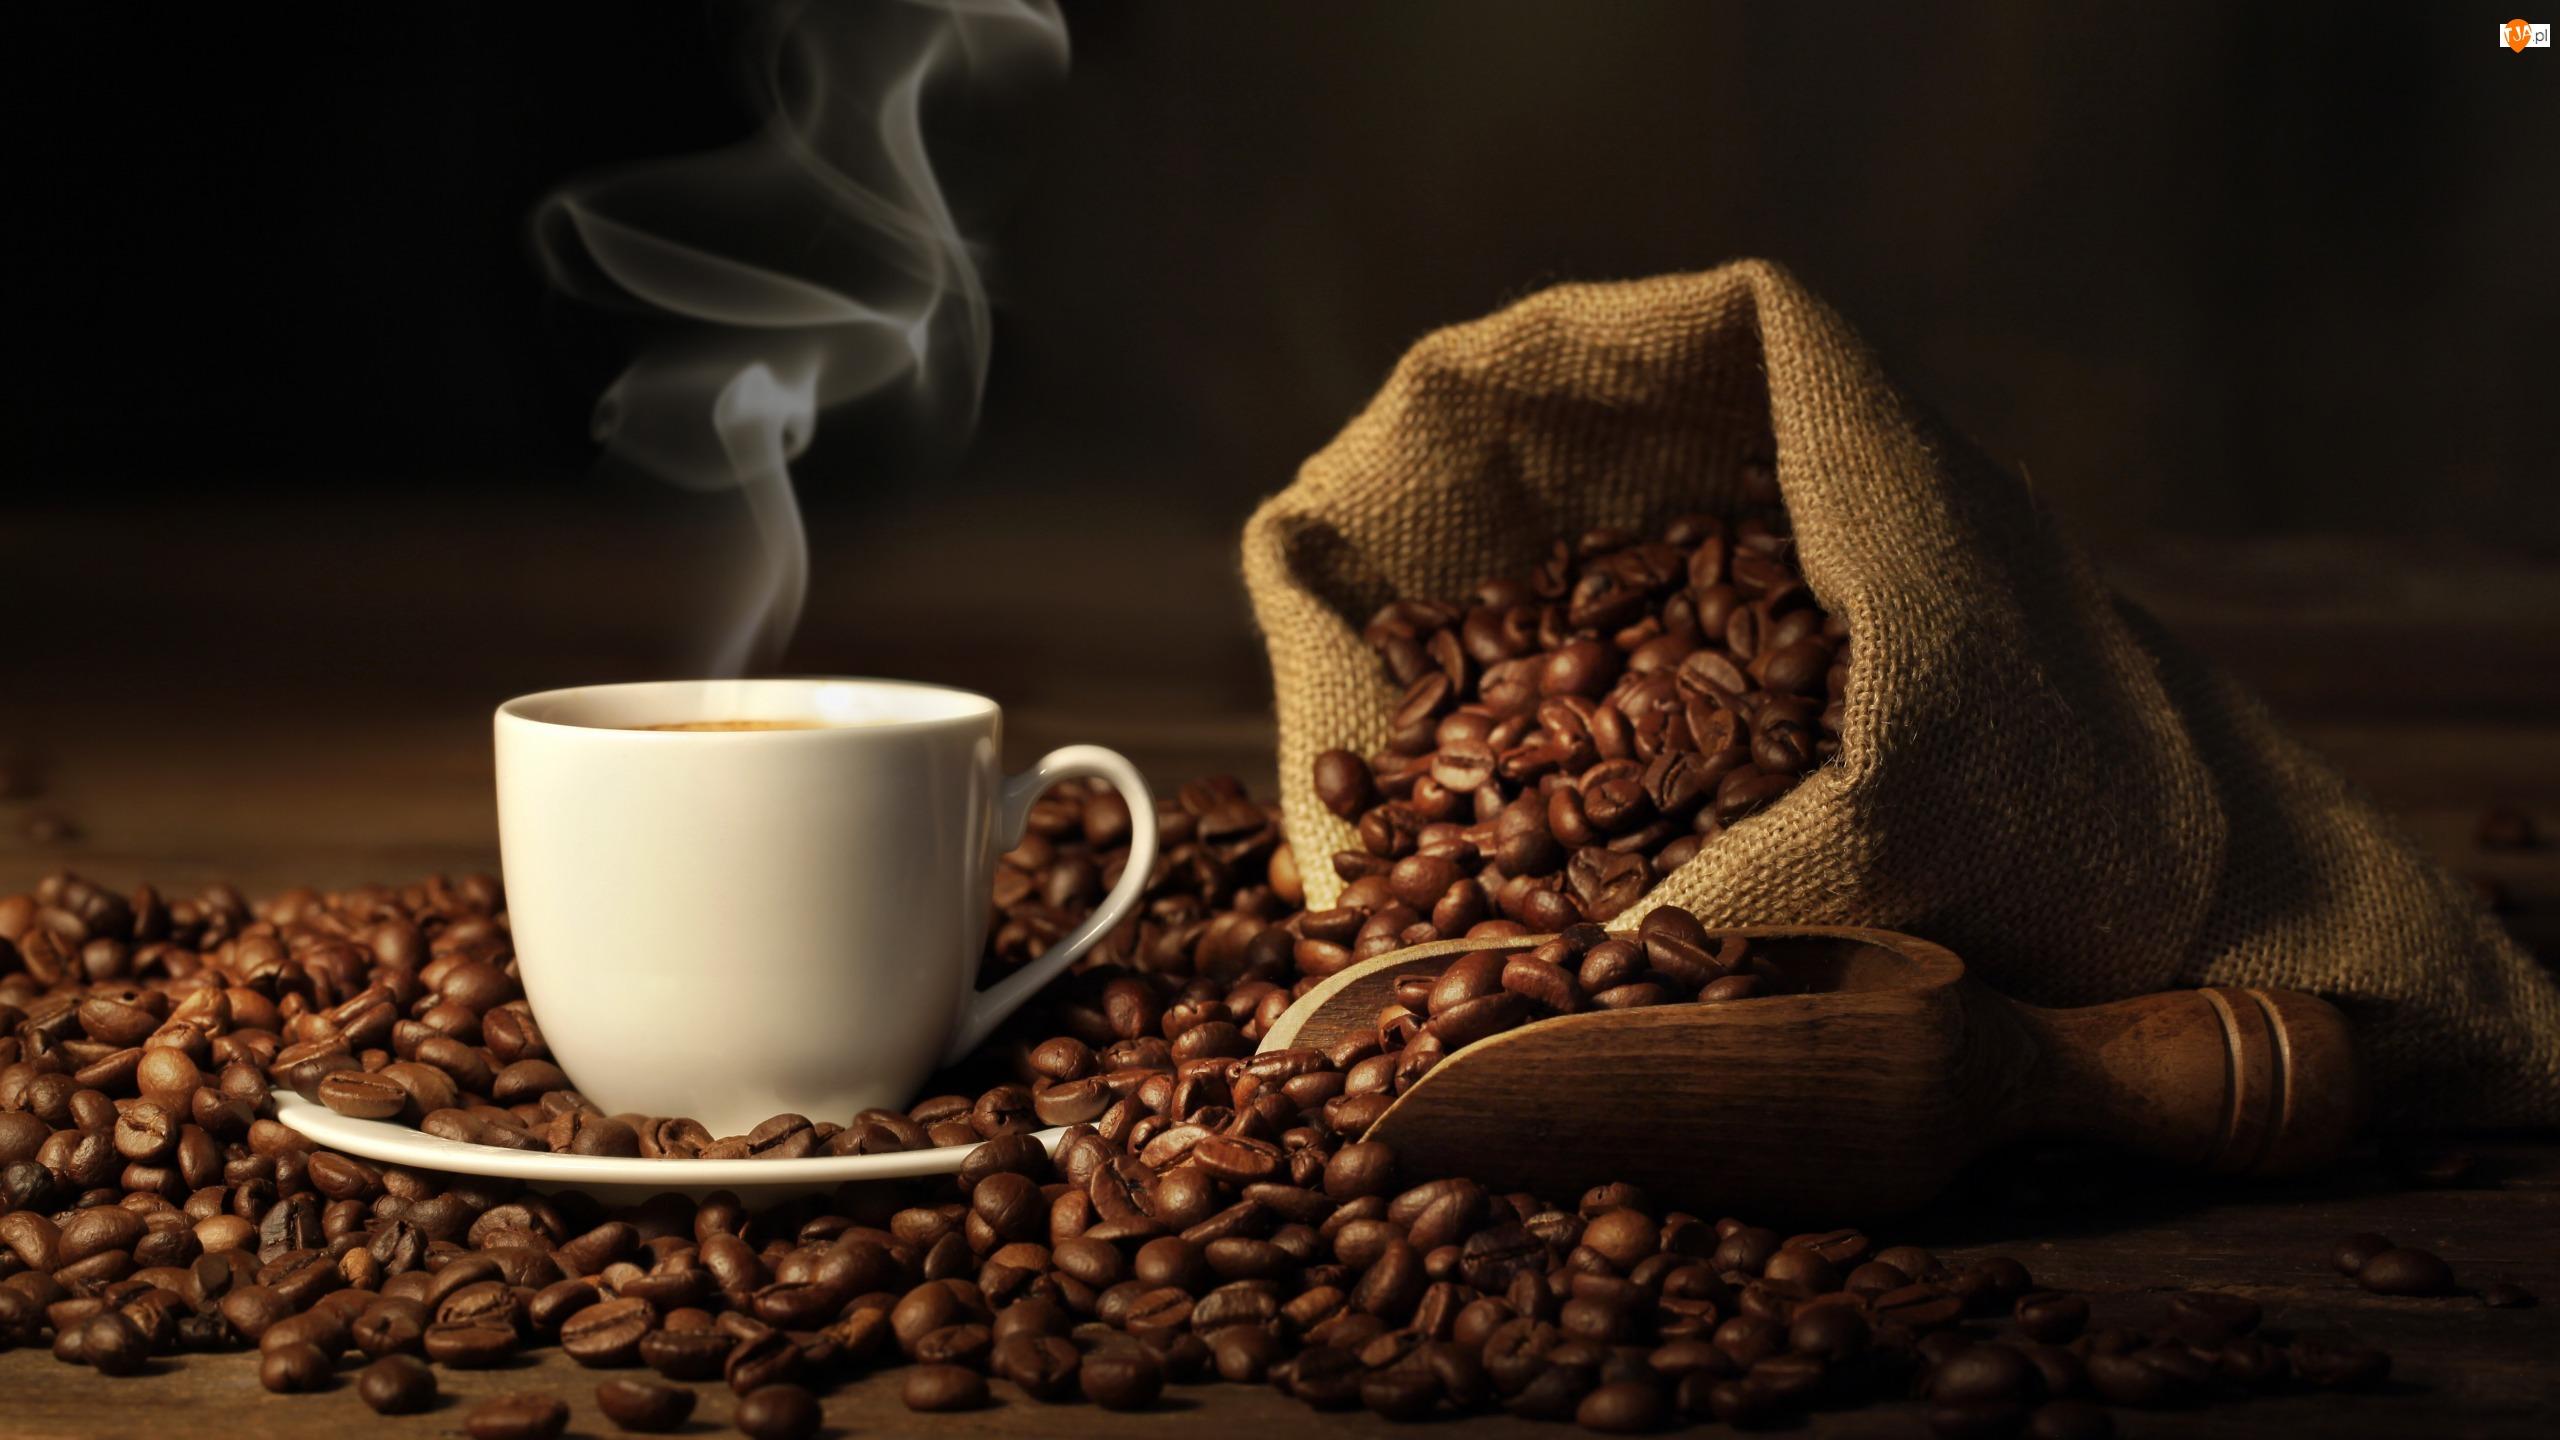 Kawa, Ziarna, Filiżanka, Worek